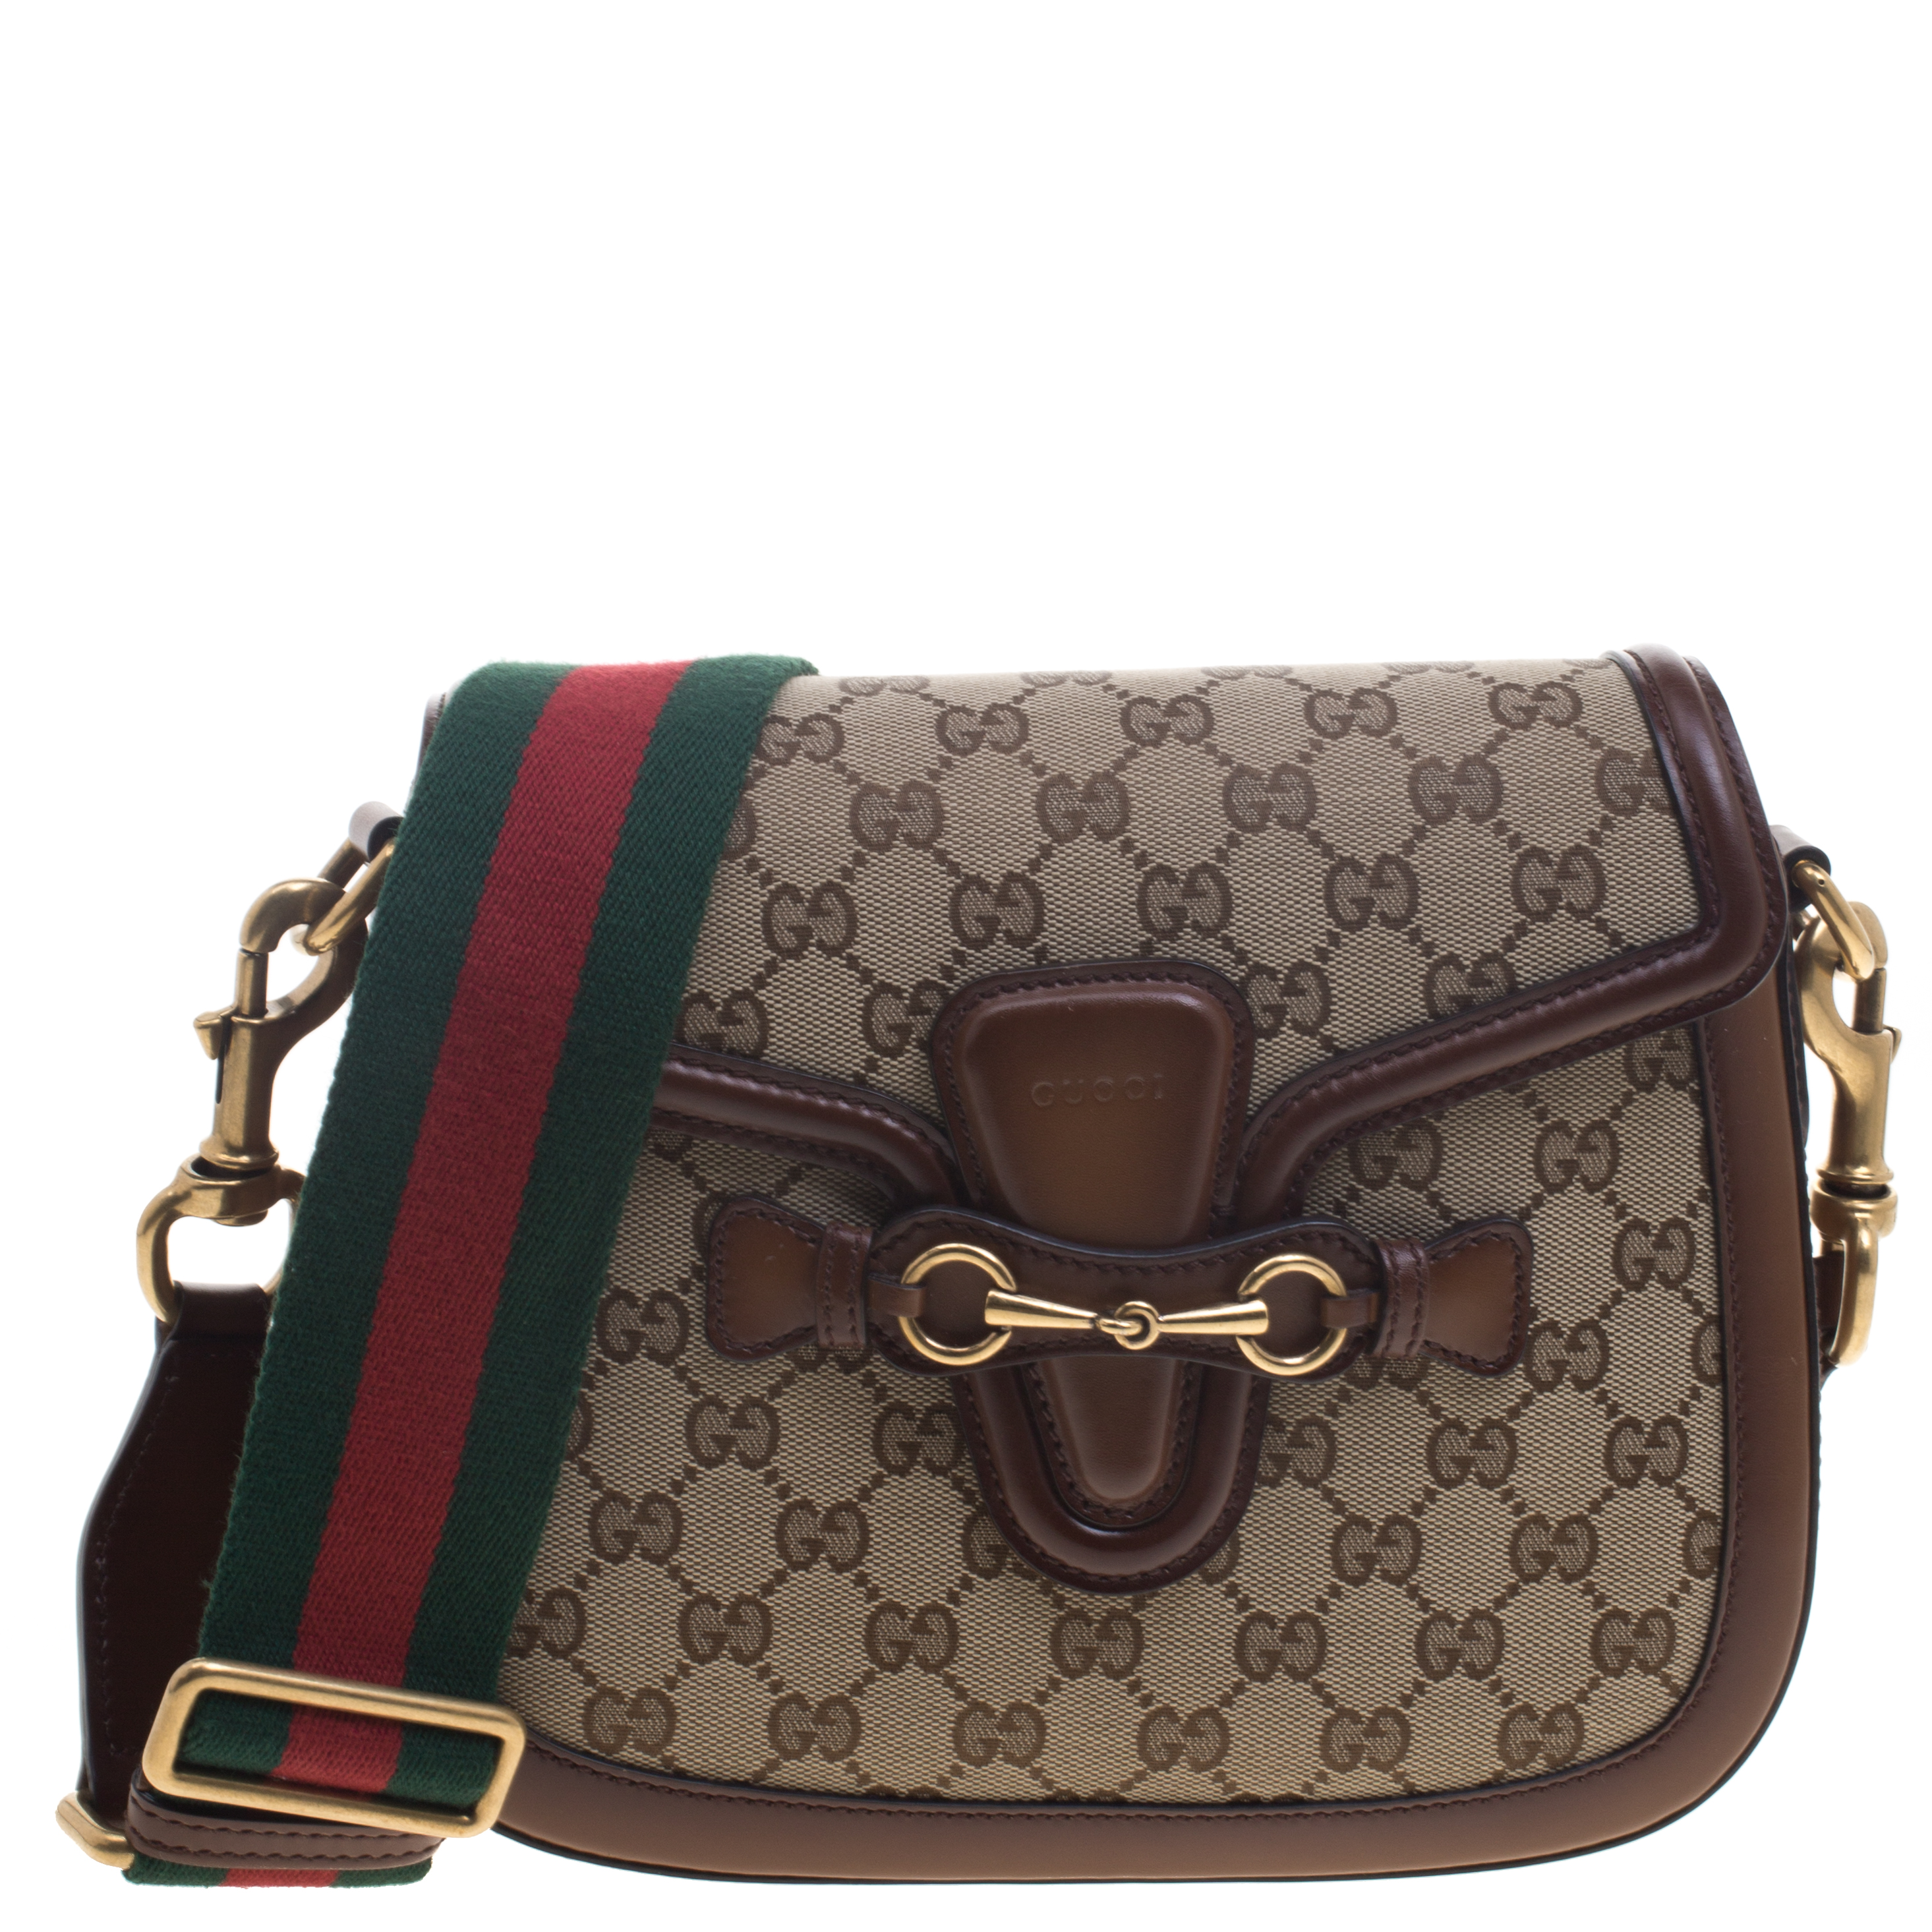 848ff997e8069 Buy Gucci Brown Beige GG Canvas Medium Lady Web Shoulder Bag 94245 ...